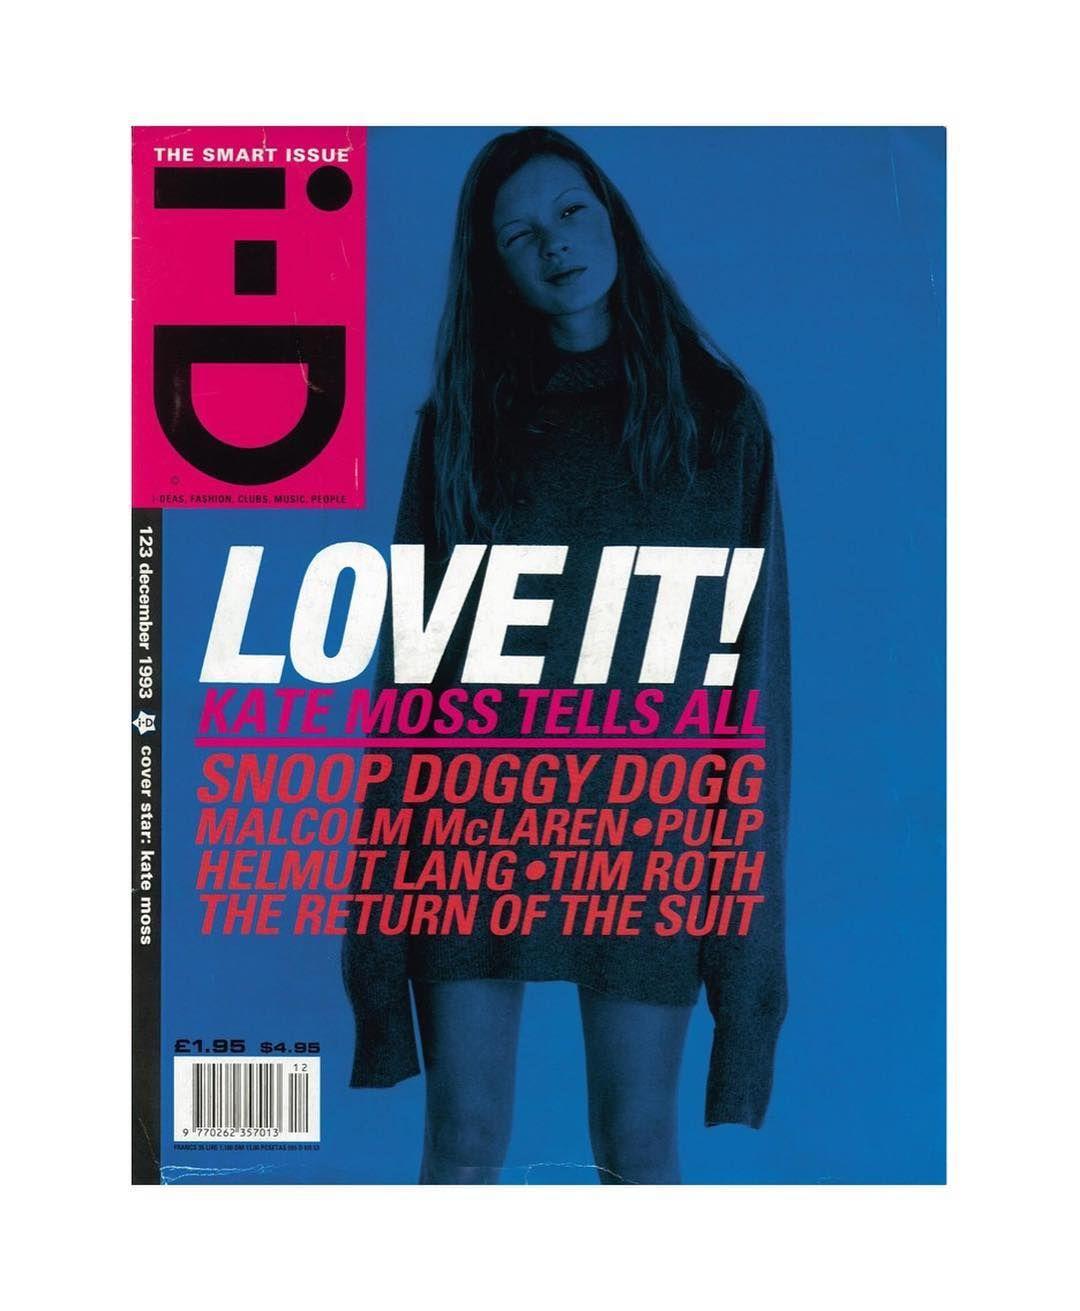 Flavio Tarquini On Instagram I D 1997 Idmagazine Style Inspiration Magazine Today Katemoss Artdir Kate Moss Id Magazine Magazine Front Cover